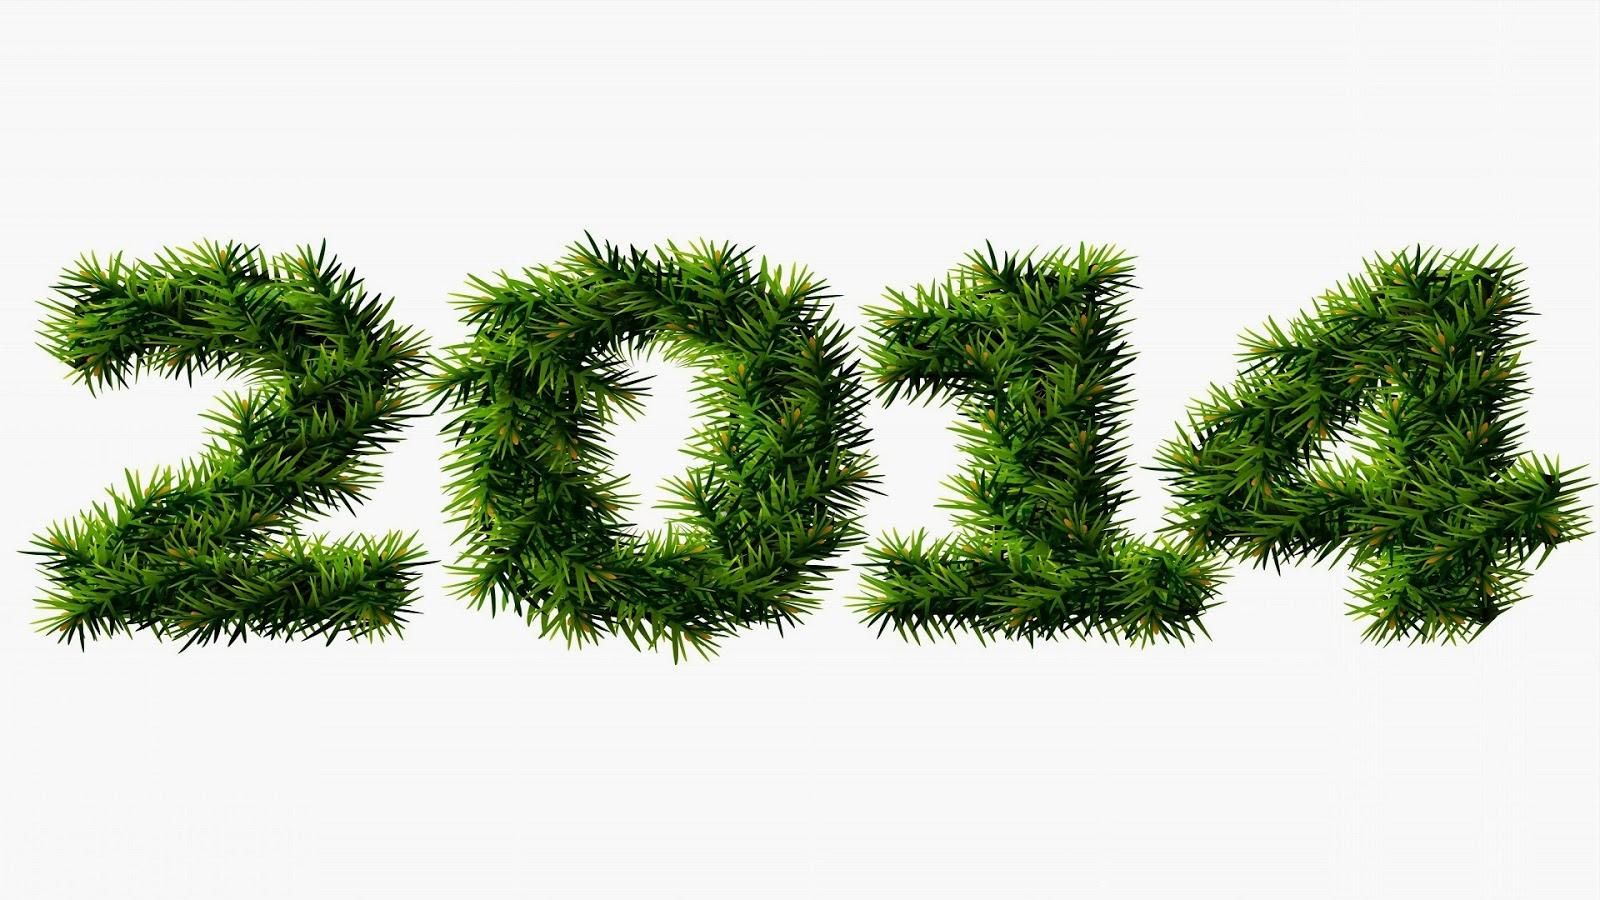 Happy new year wallpaper 2014 hd phantom forest blog happy new year wallpaper 2014 hd voltagebd Choice Image